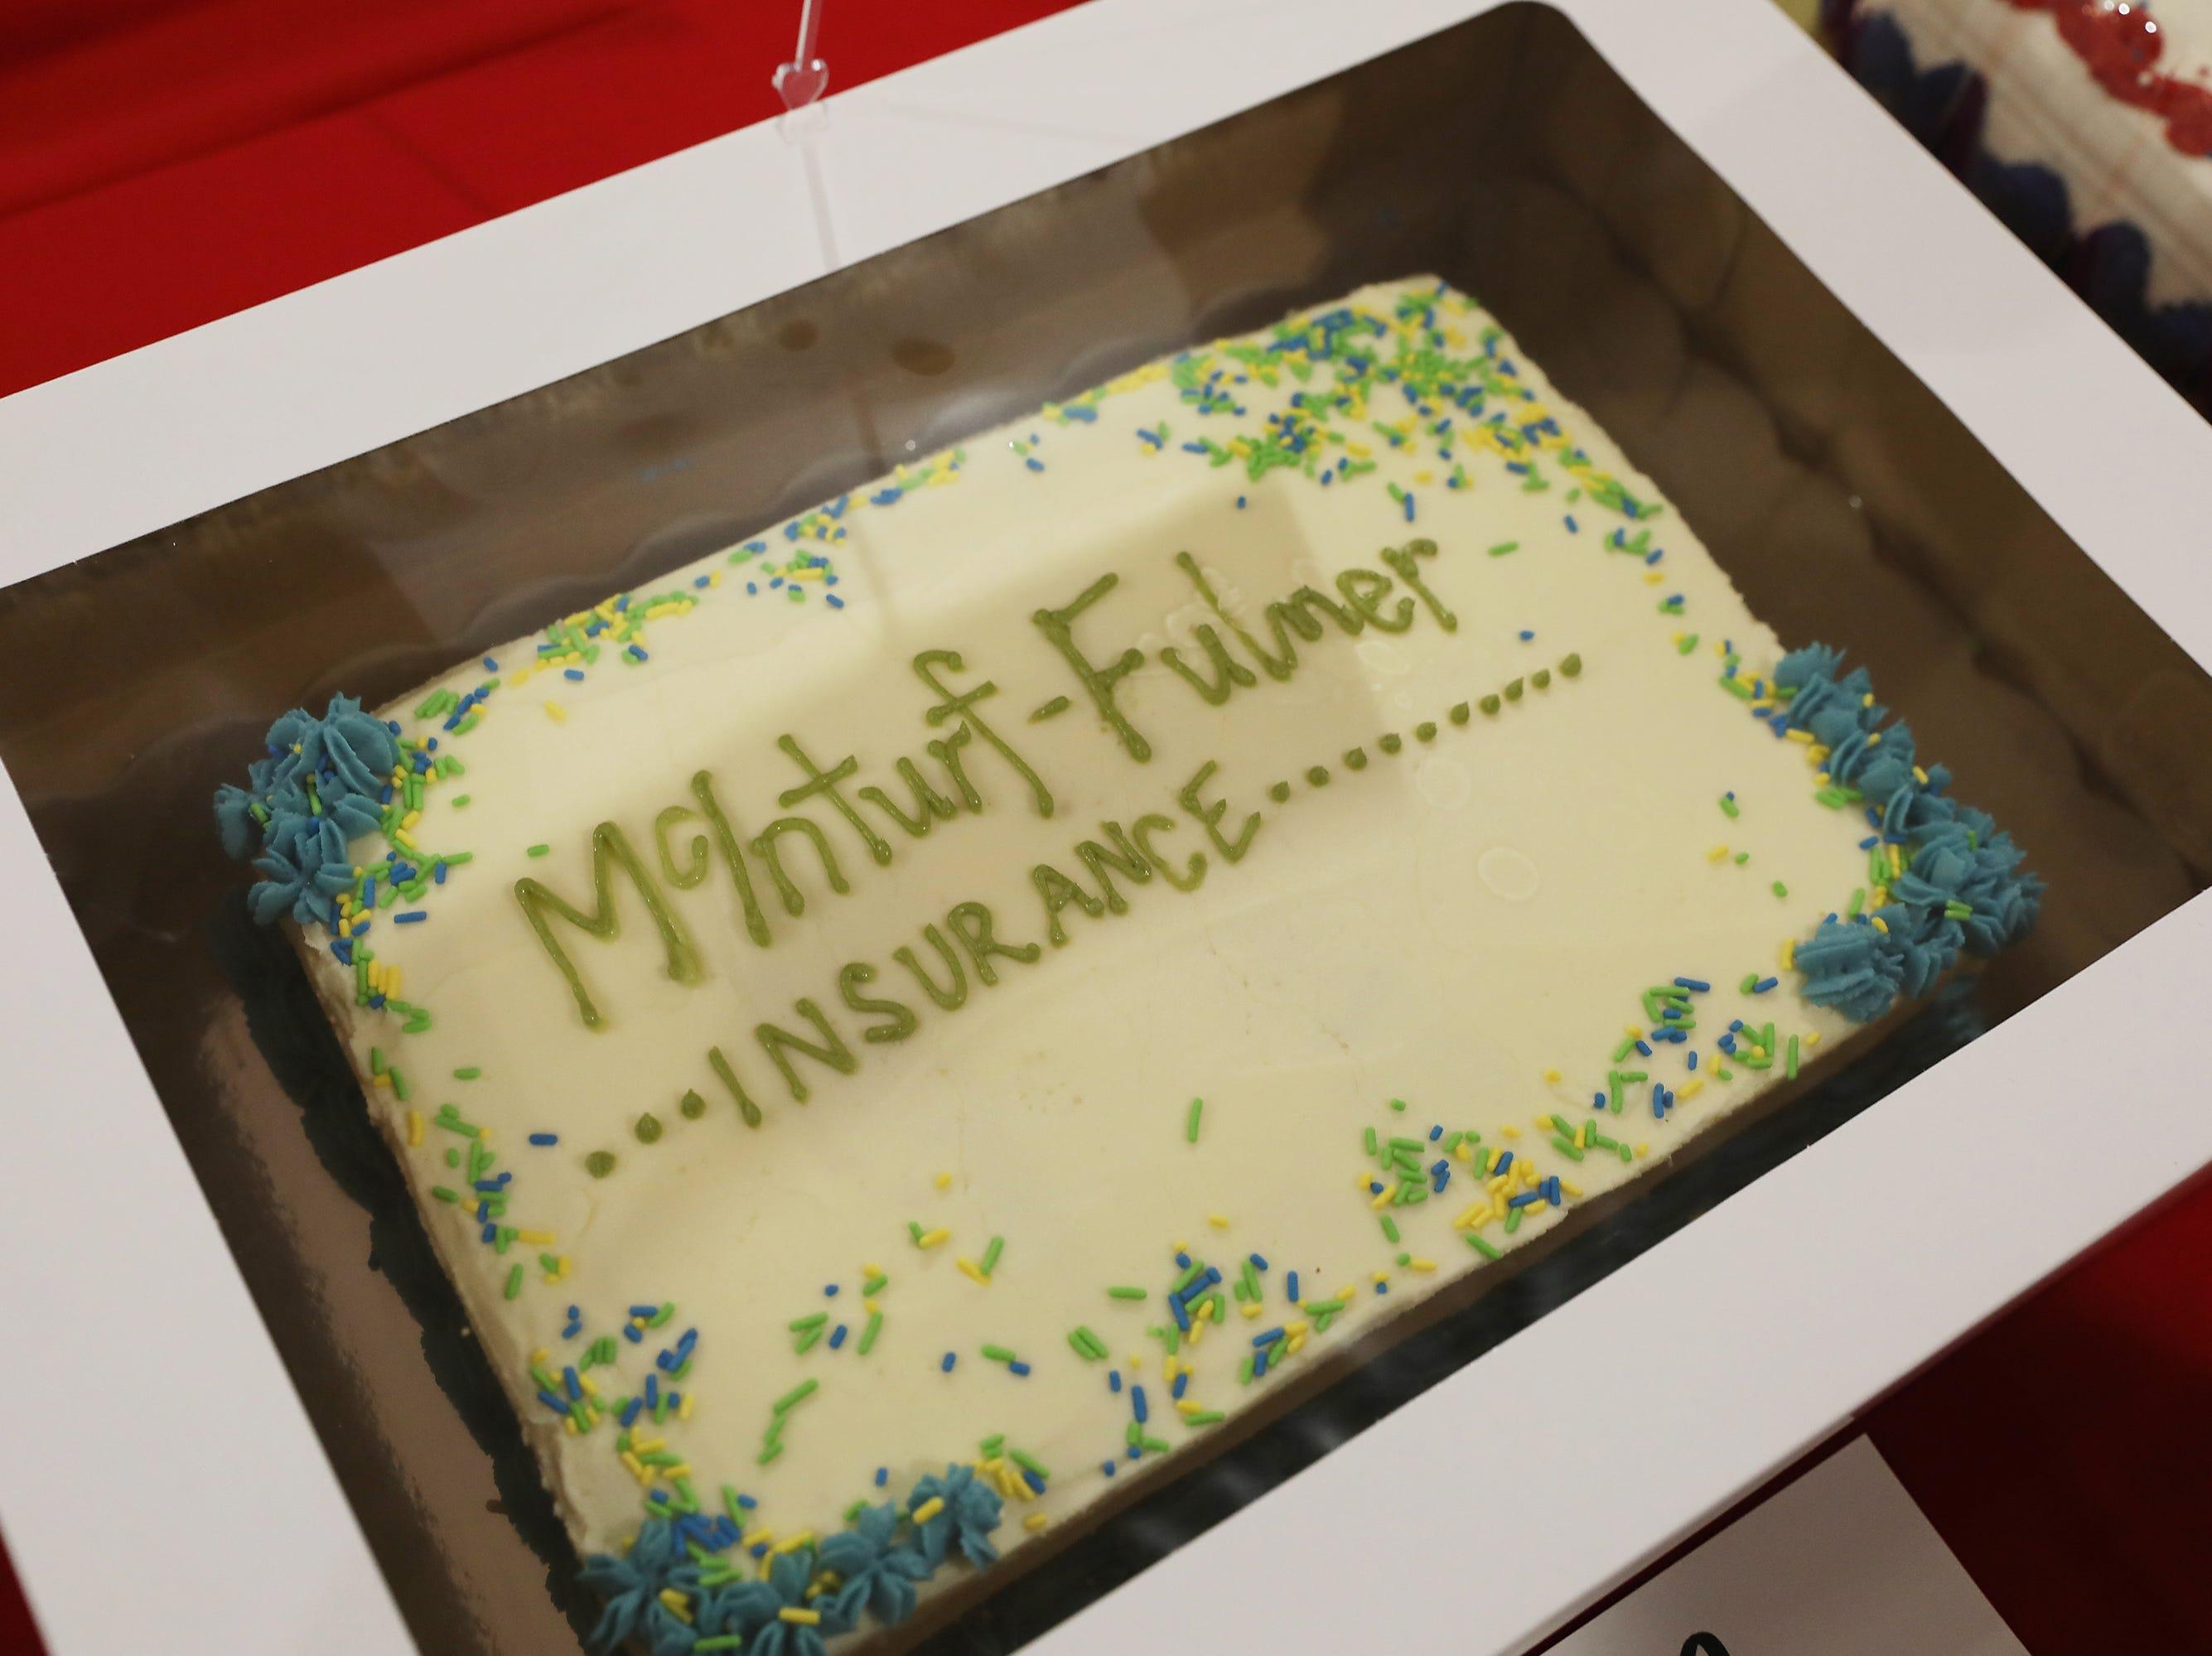 1:45 P.M. Thursday cake 112 McInturf Fulmer Insurance Group - Matz Fitness app, $50 gift cards to Olde Falls Inn and Donald's Donuts